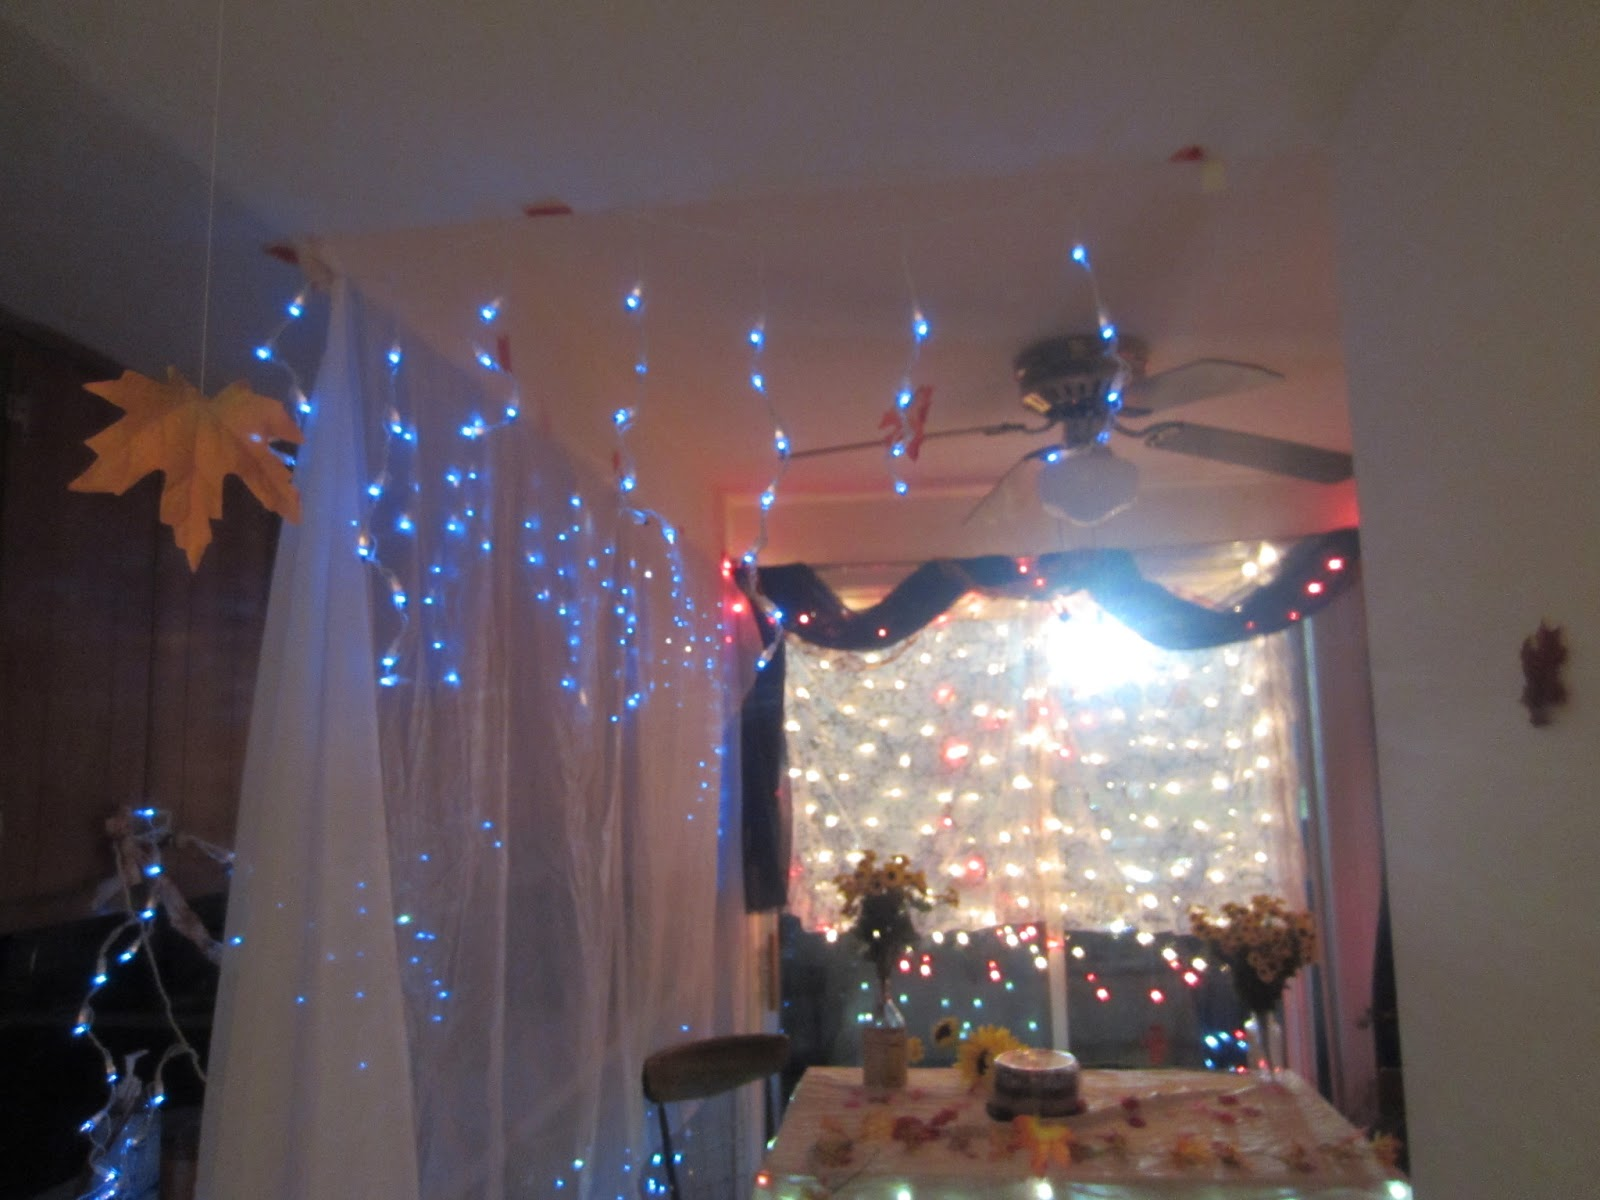 romantic stay at home anniversary ideas home decor ideas